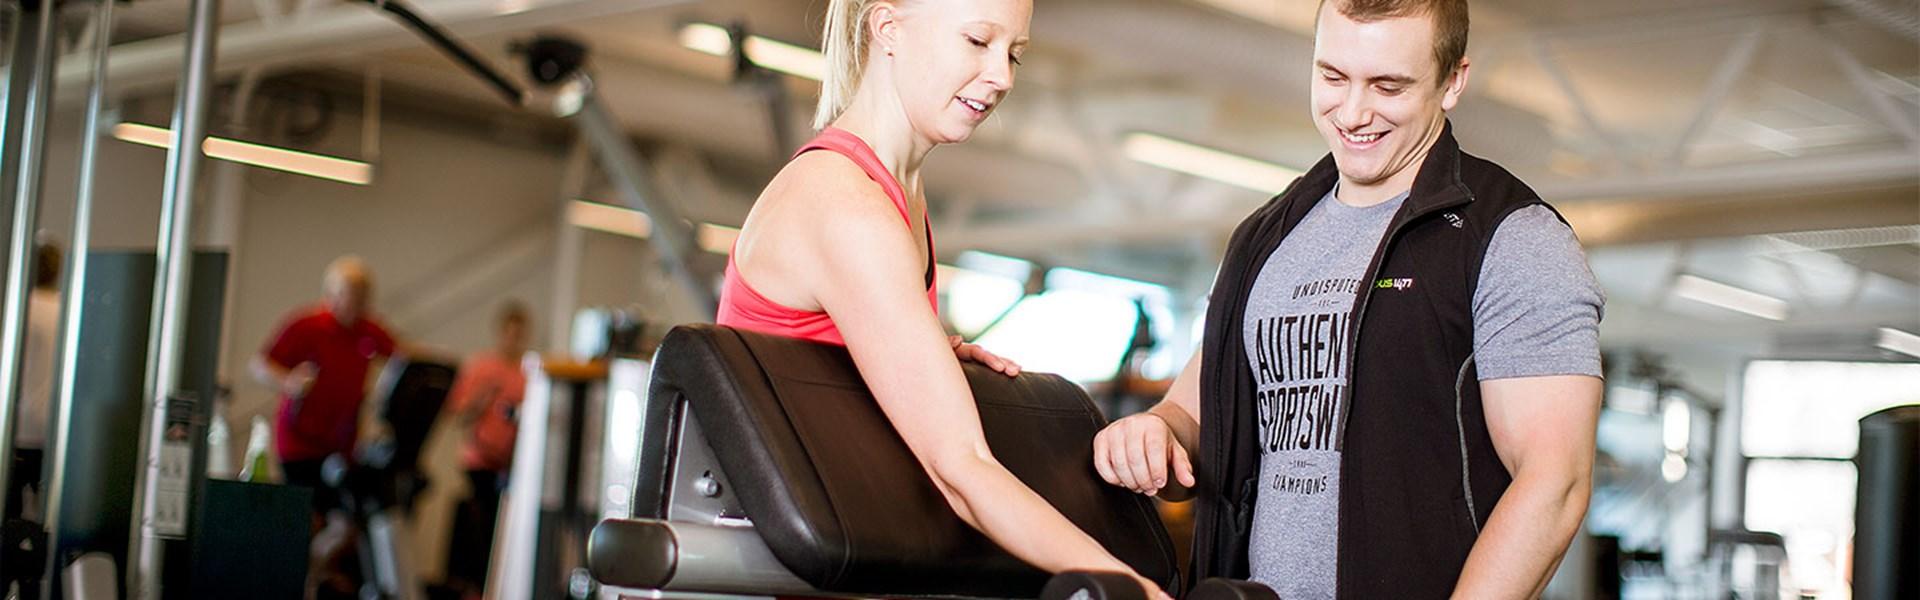 Campus1477 gym i Uppsala - Introduction to the gym 597b32af79a0e